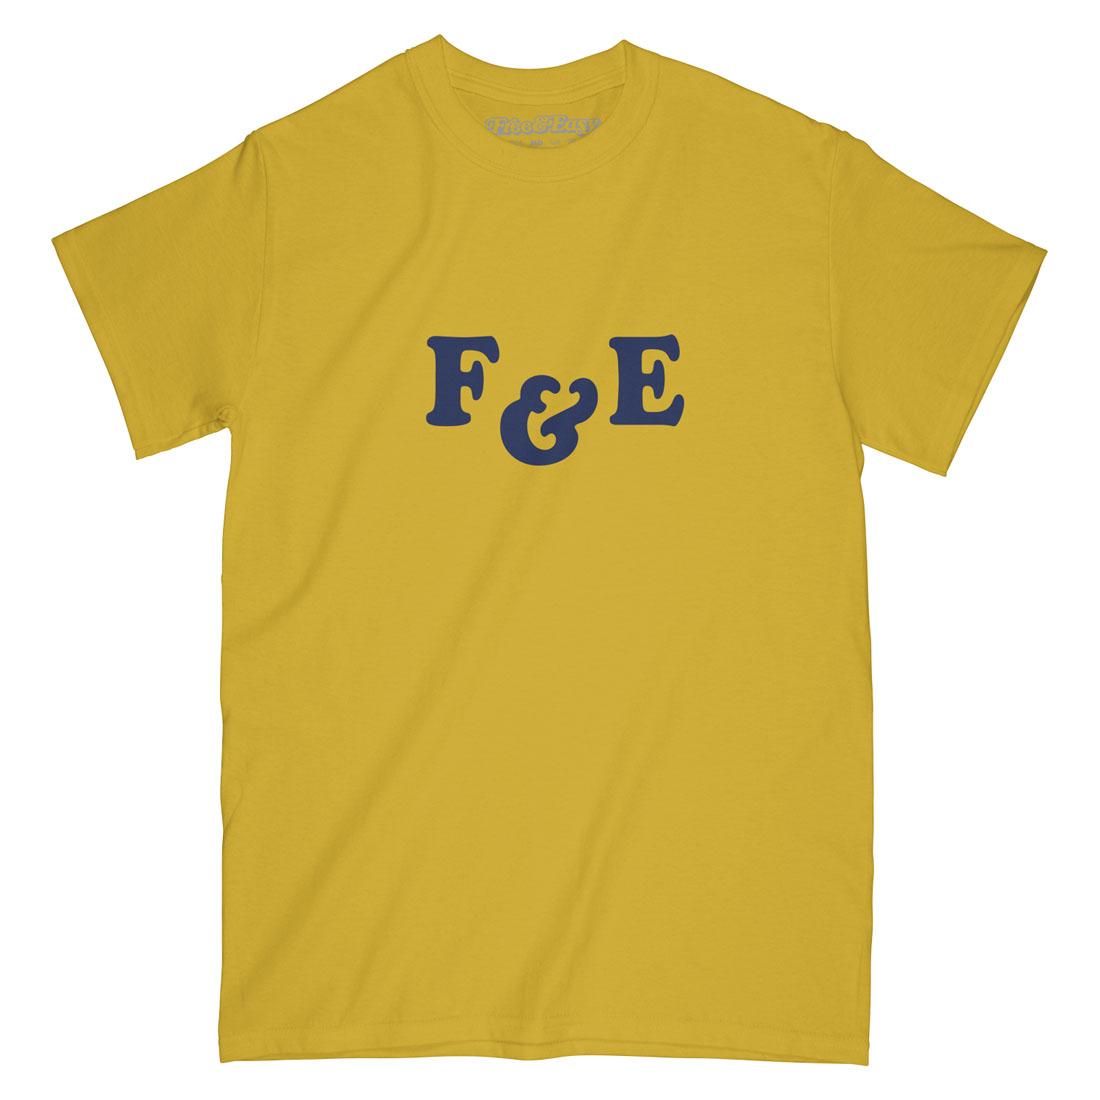 FE-904_52.jpg